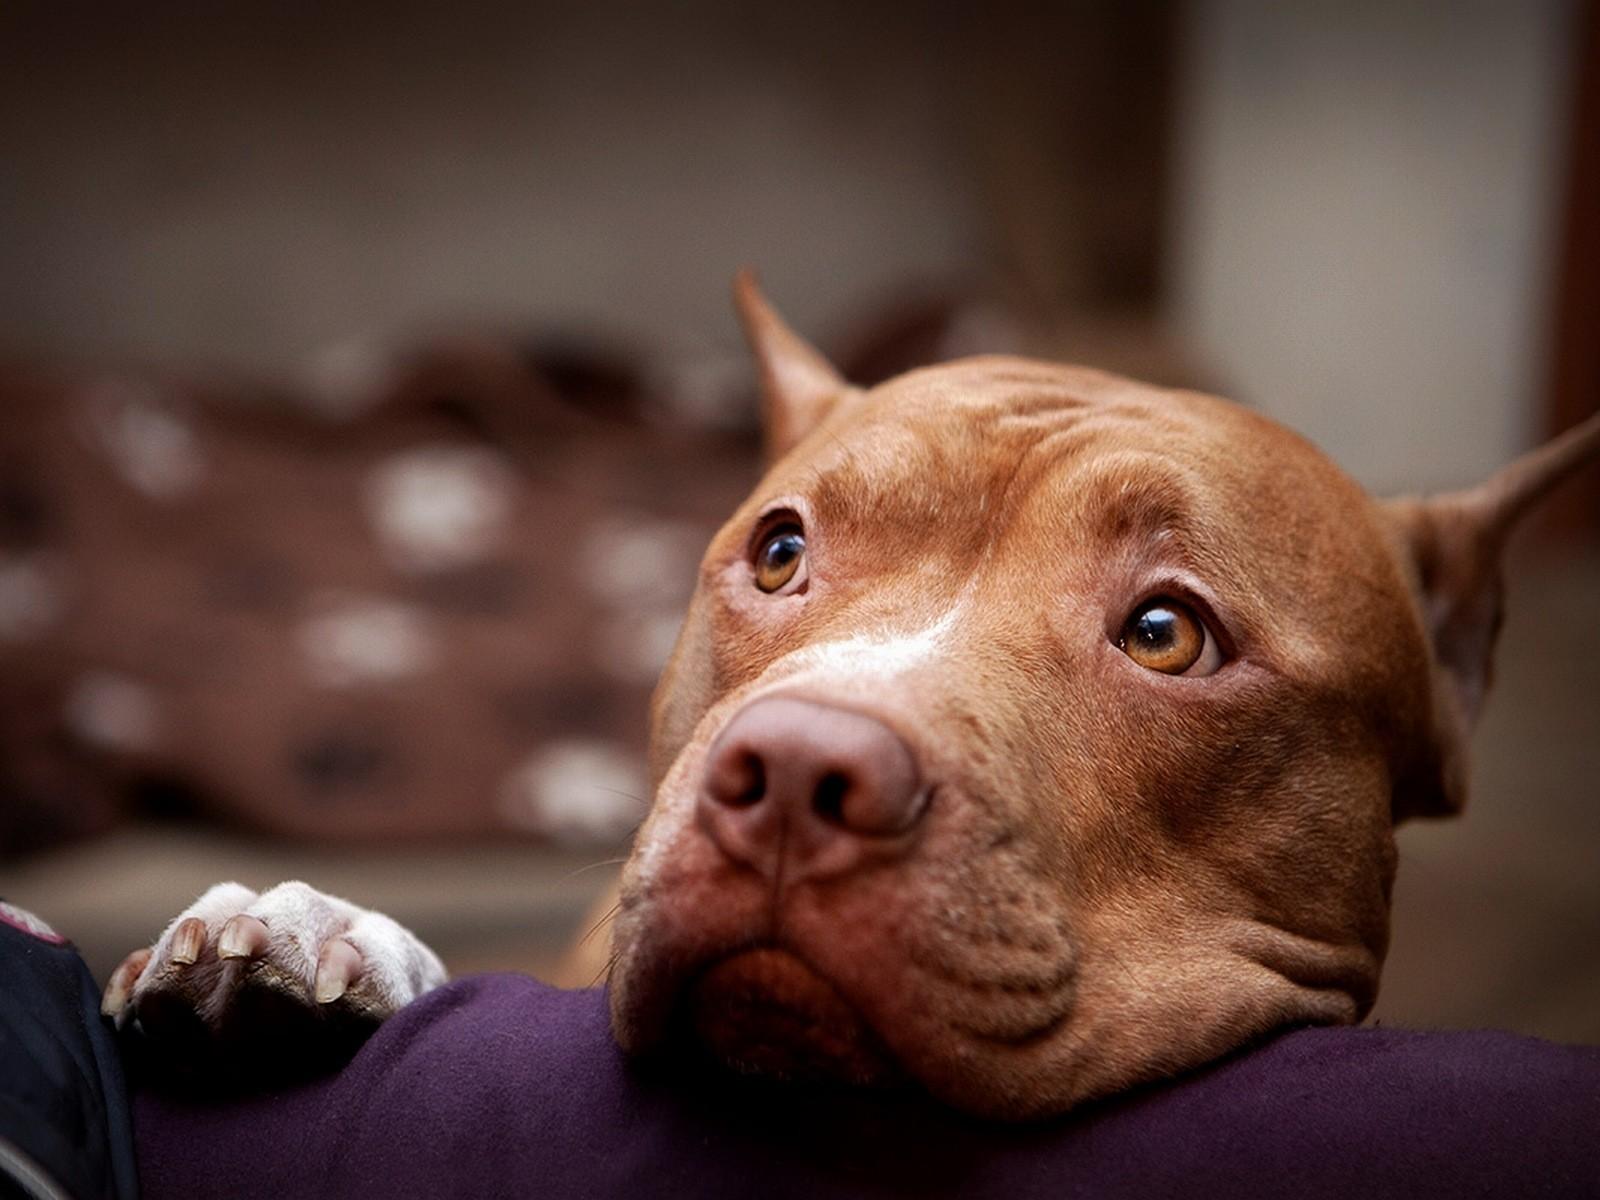 Pitbull Dog Hd Wallpapers And Desktop Download 1600x1200